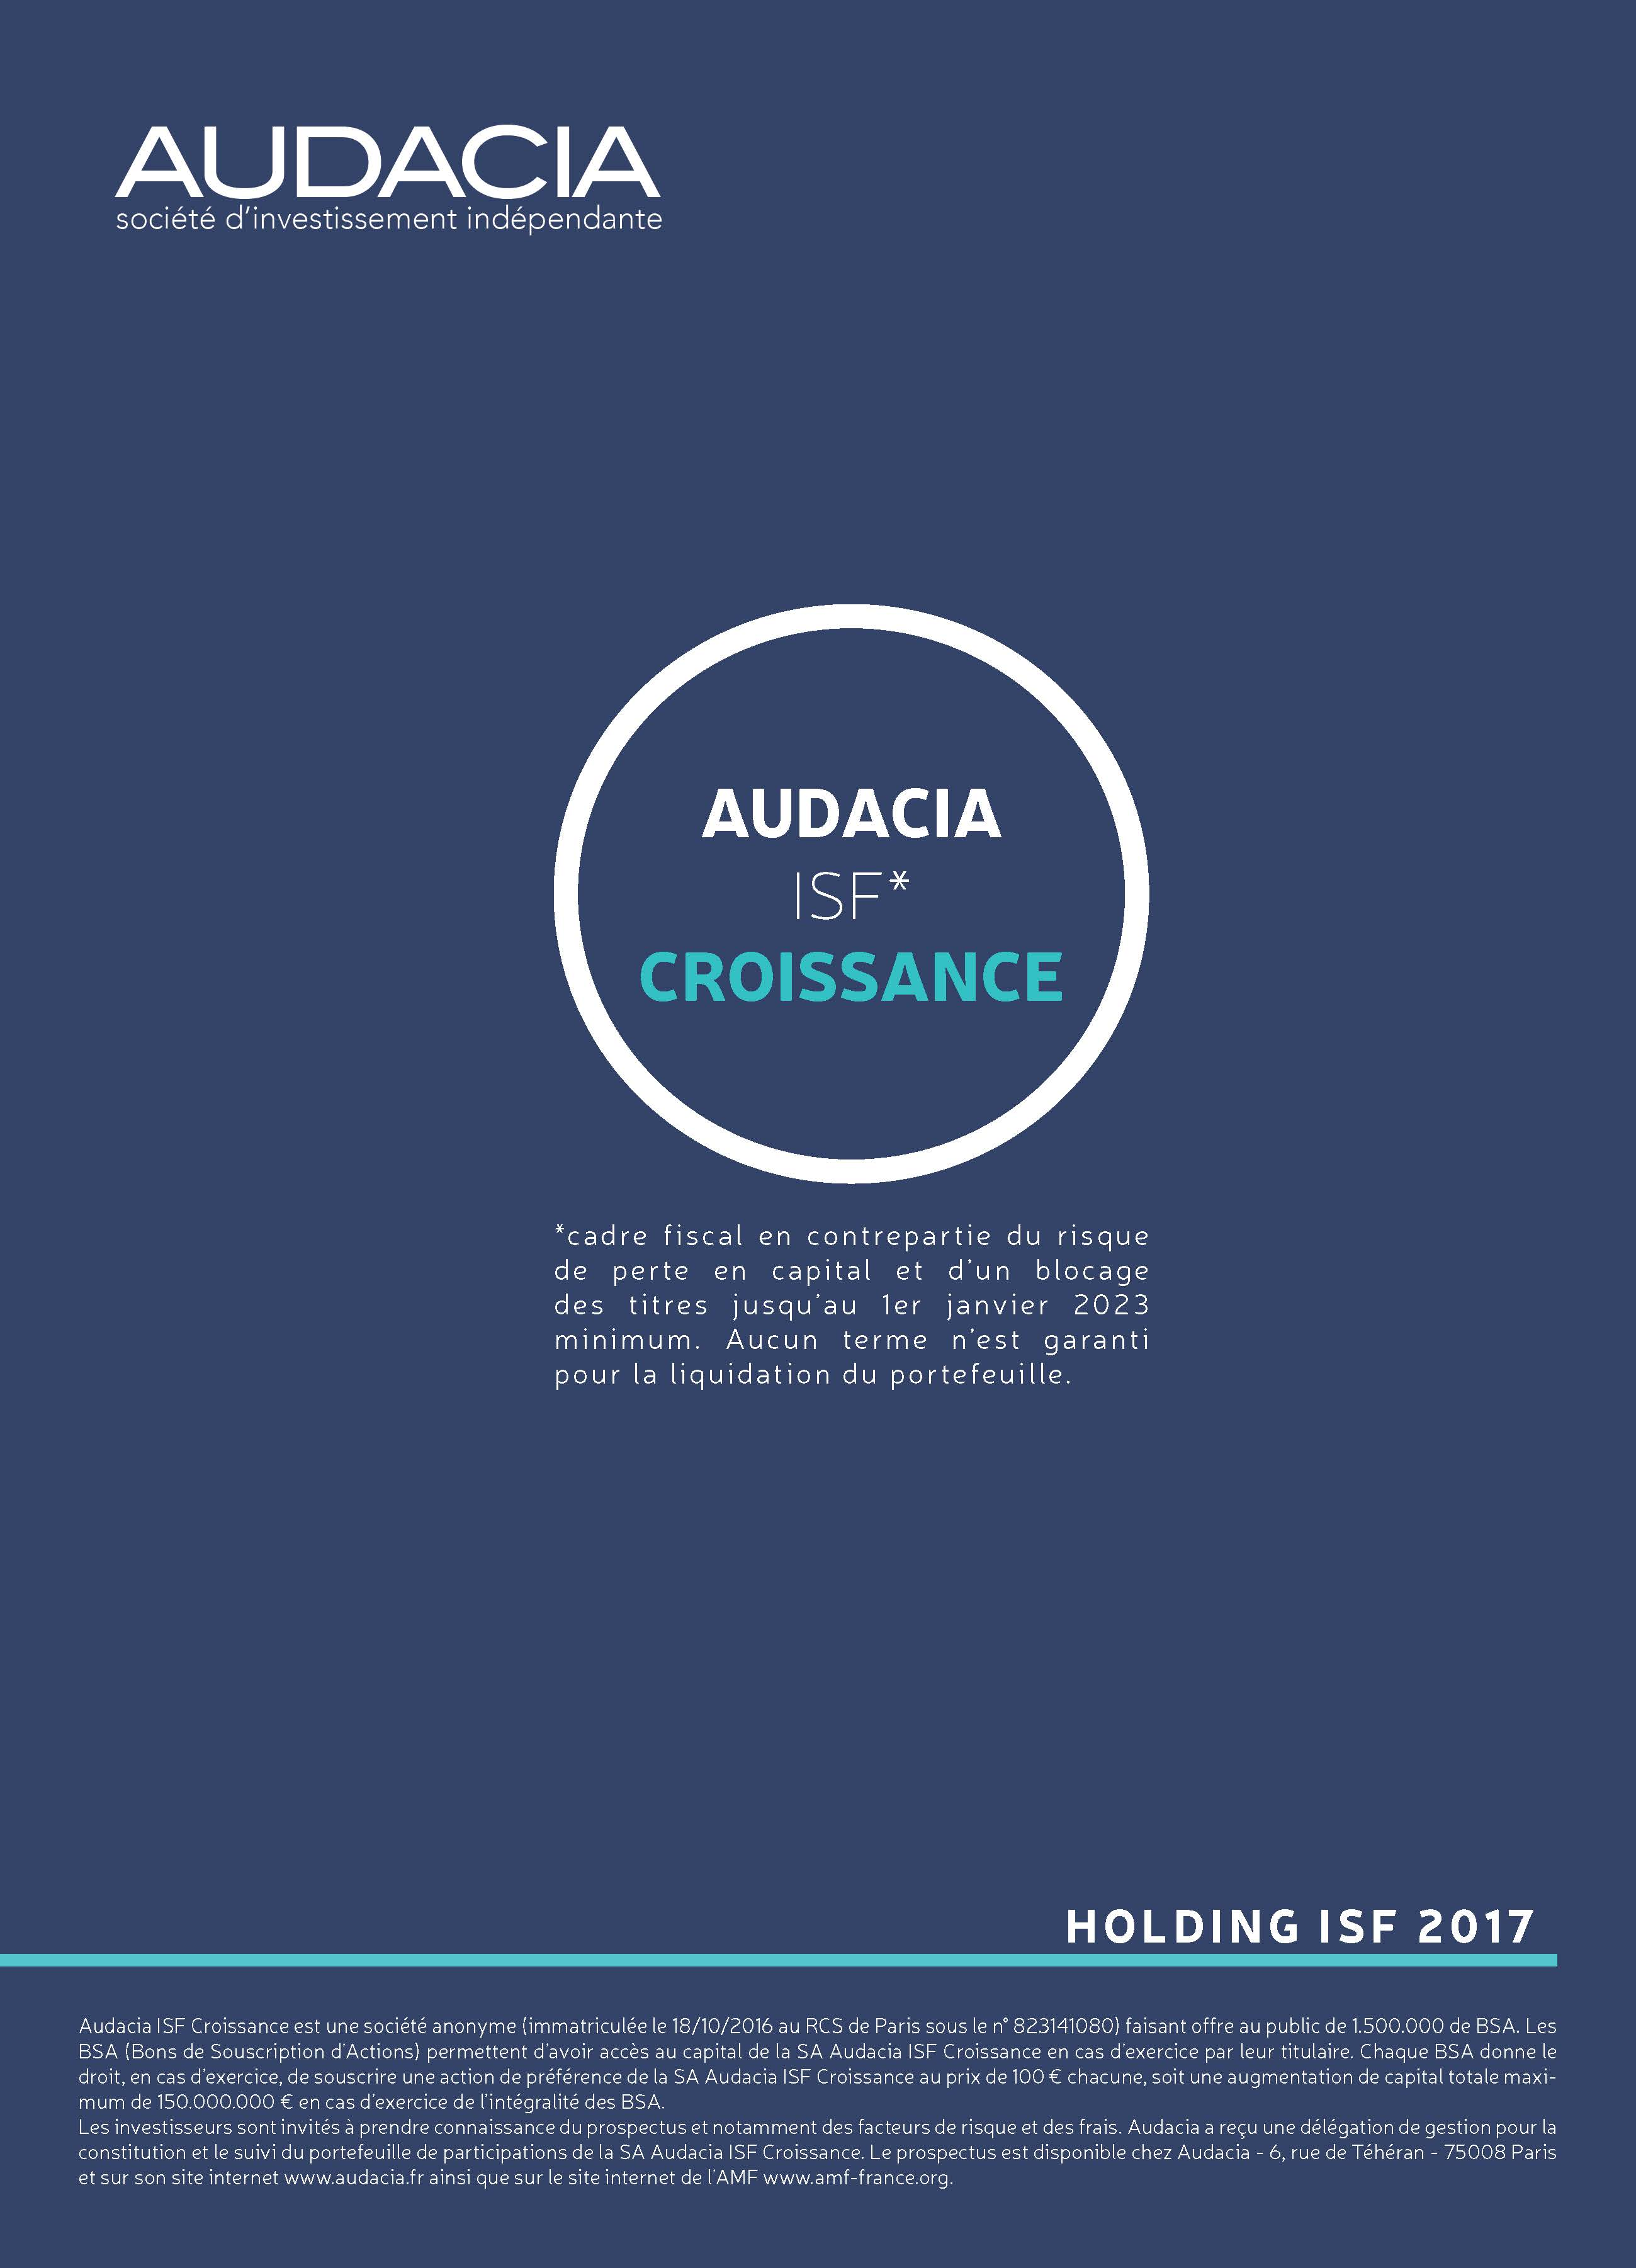 AUDACIA ISF Croissance 2017